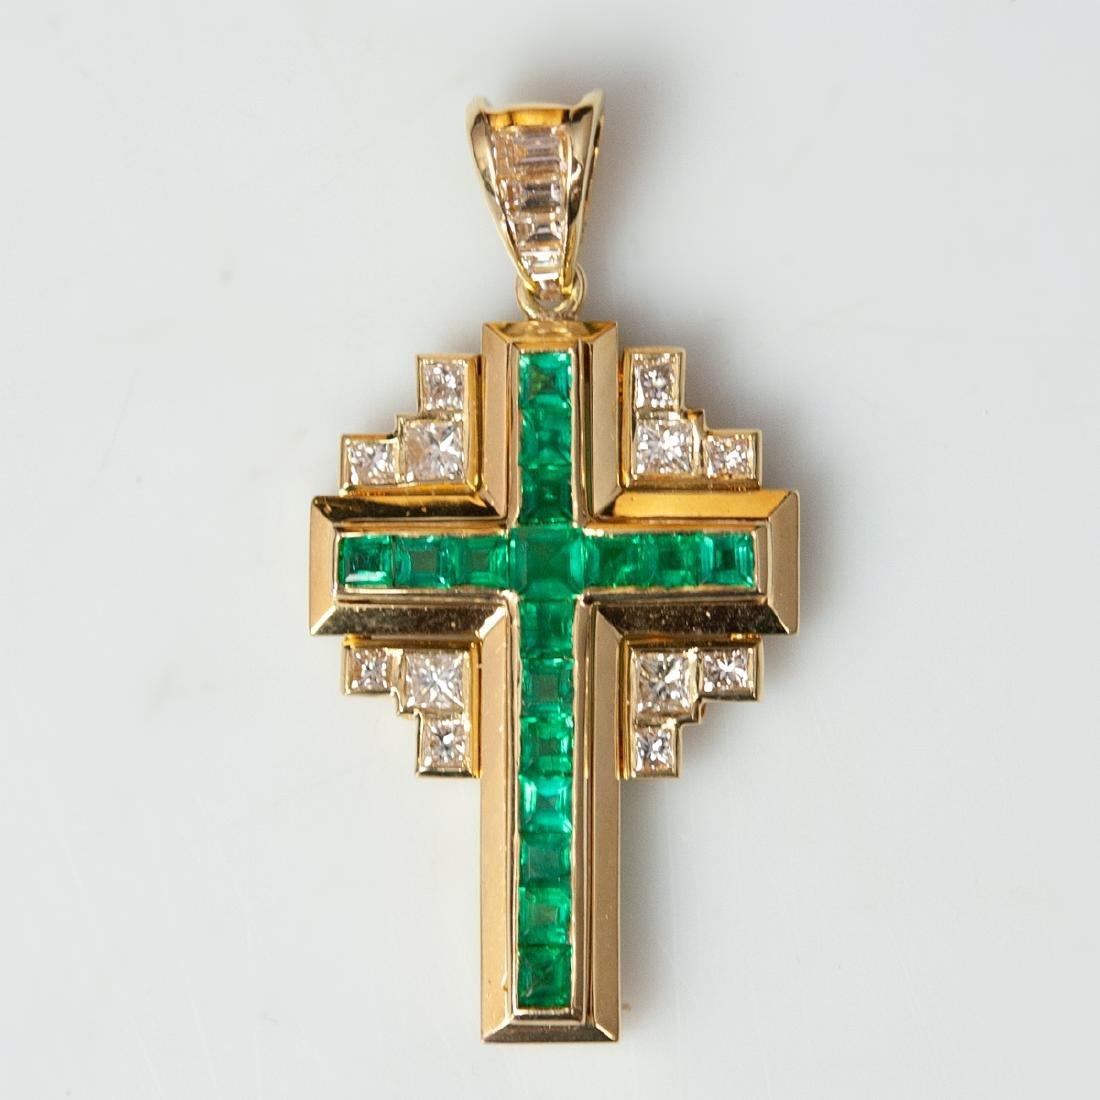 18kt Gold Emerald & Diamond Cross Pendant